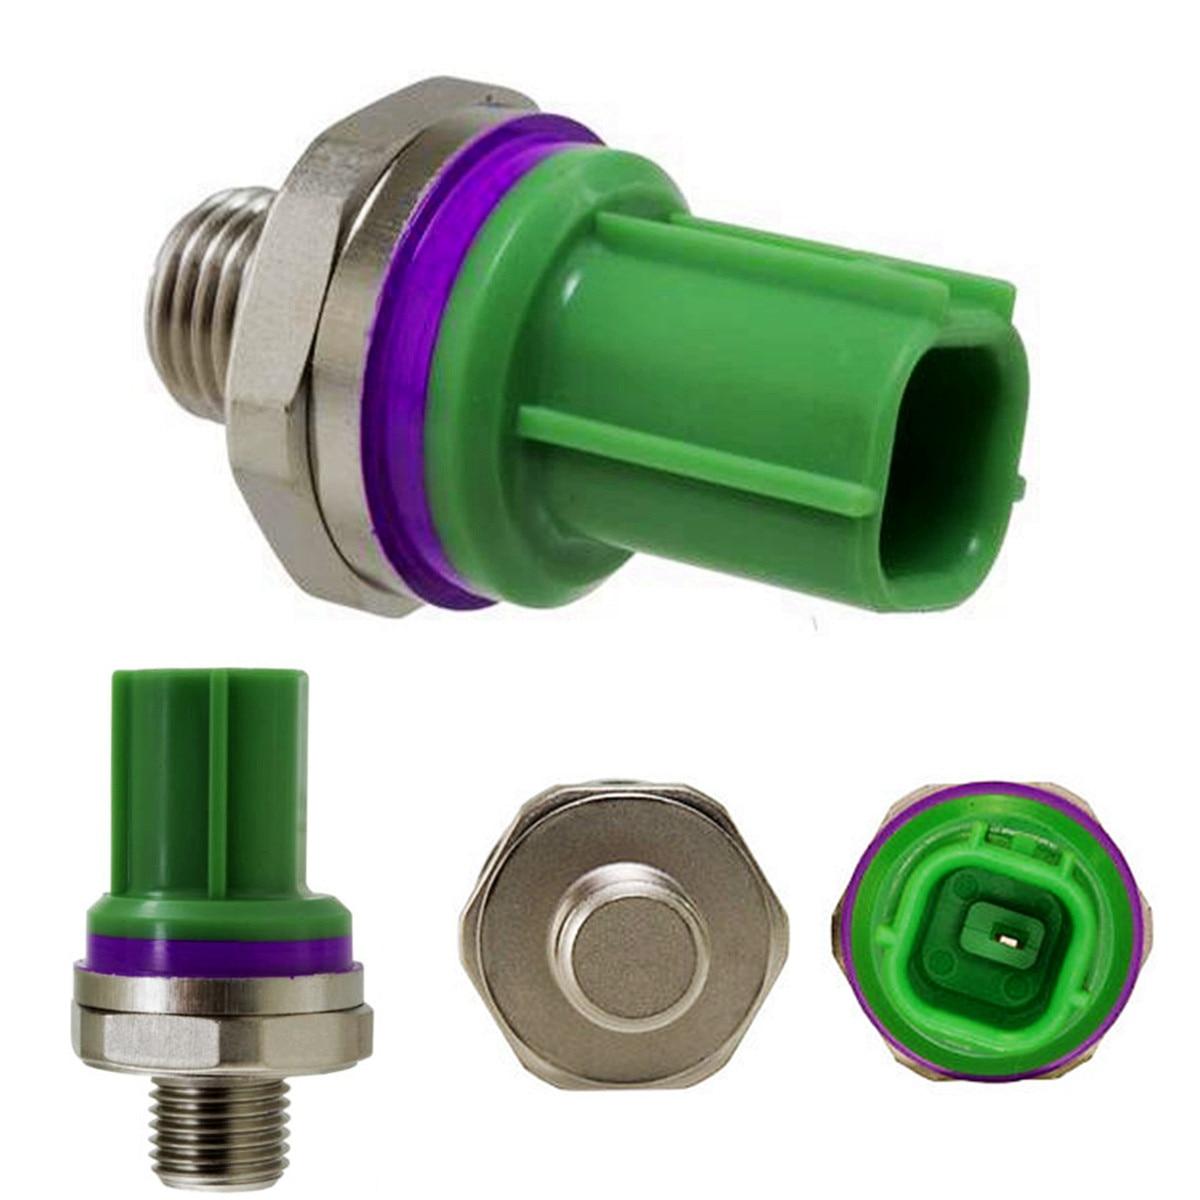 Knock Sensor สำหรับ Honda/Civic Si 2006 2007 2008 2009 2010 2011 30530-PRC-003 KS300 5S9087